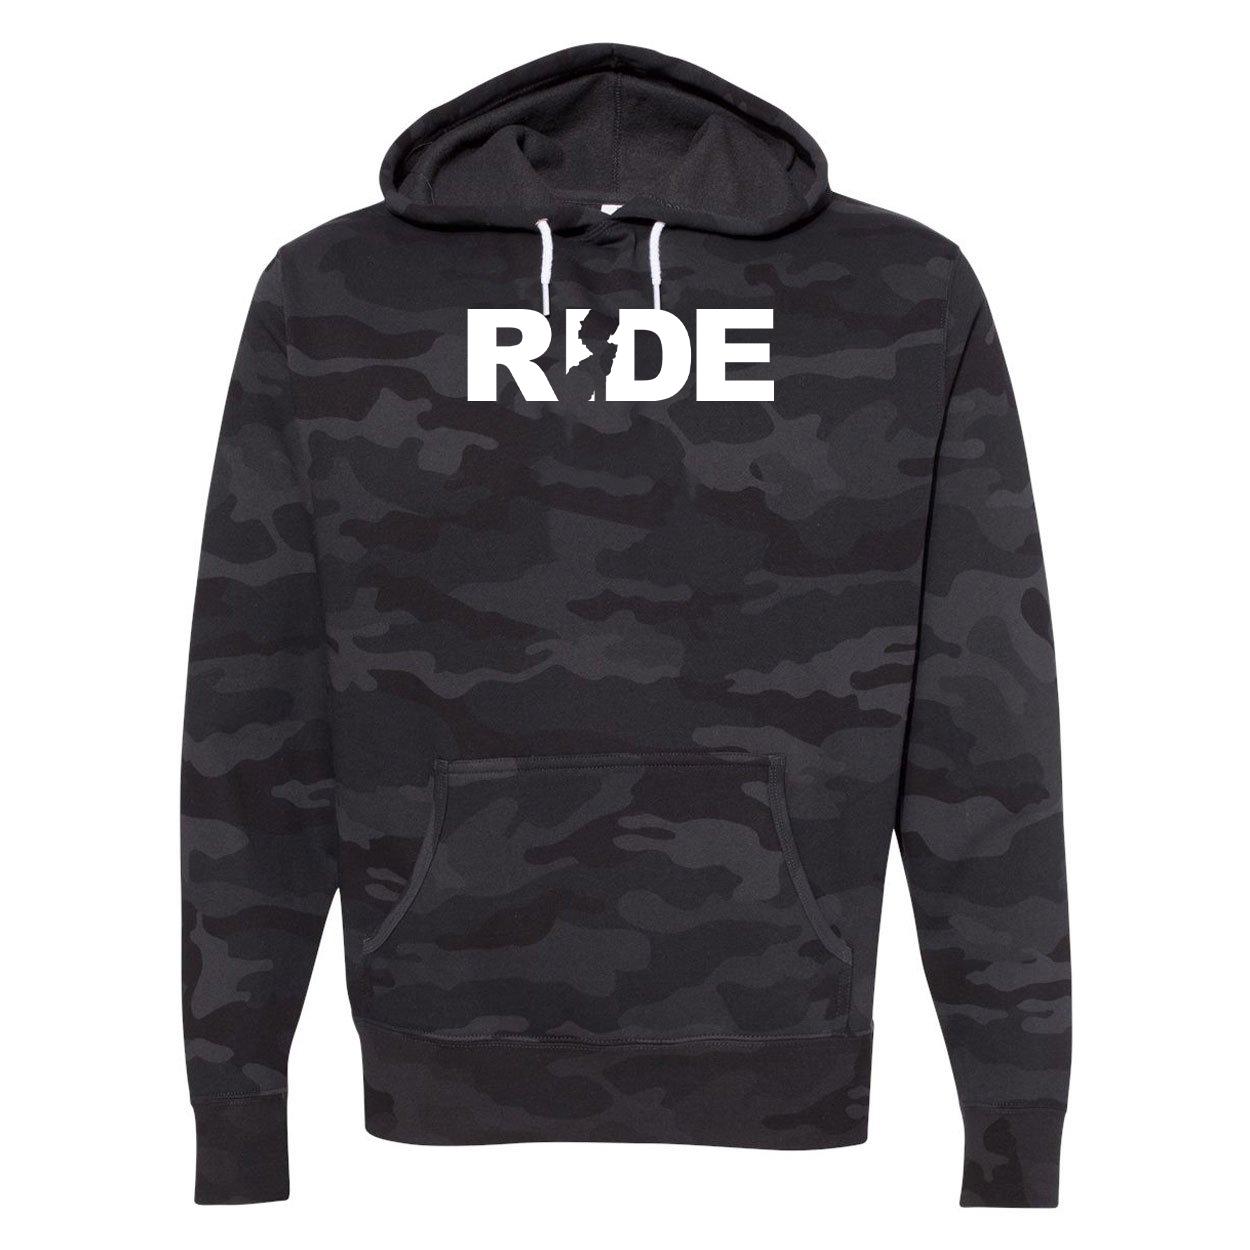 Ride New Jersey Classic Unisex Hooded Sweatshirt Black Camo (White Logo)